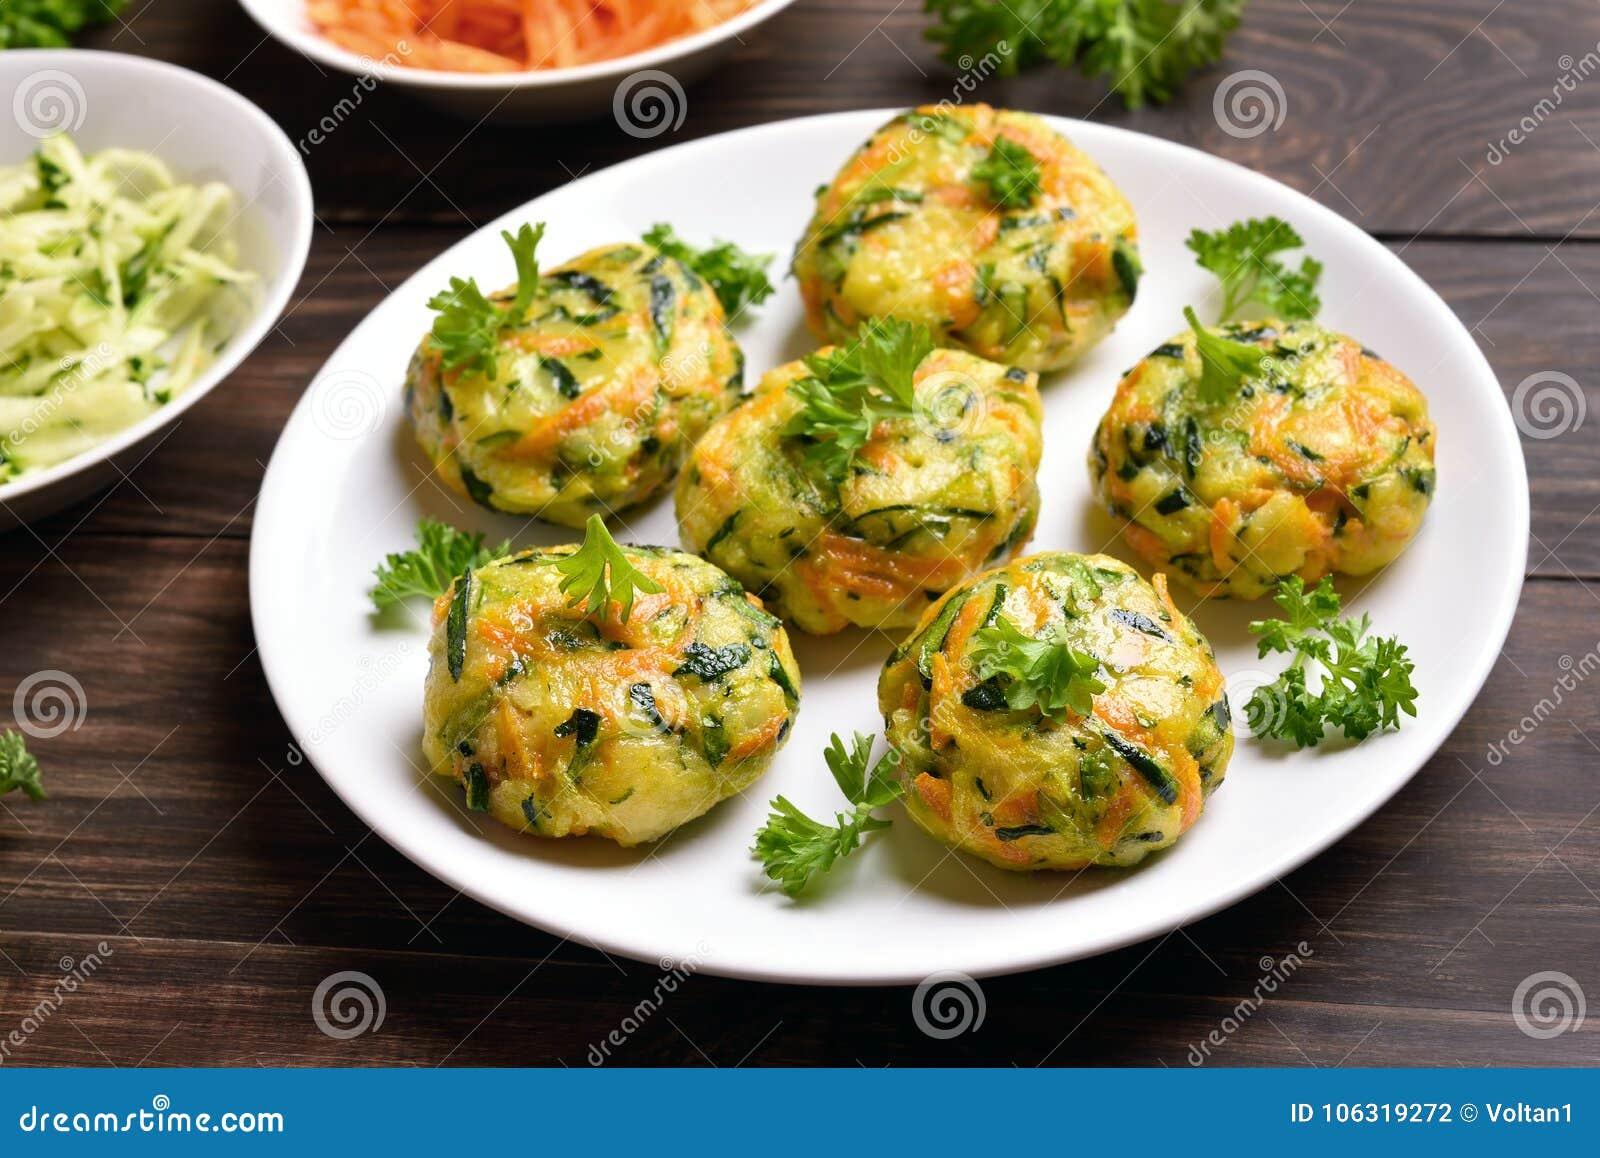 banta med potatis